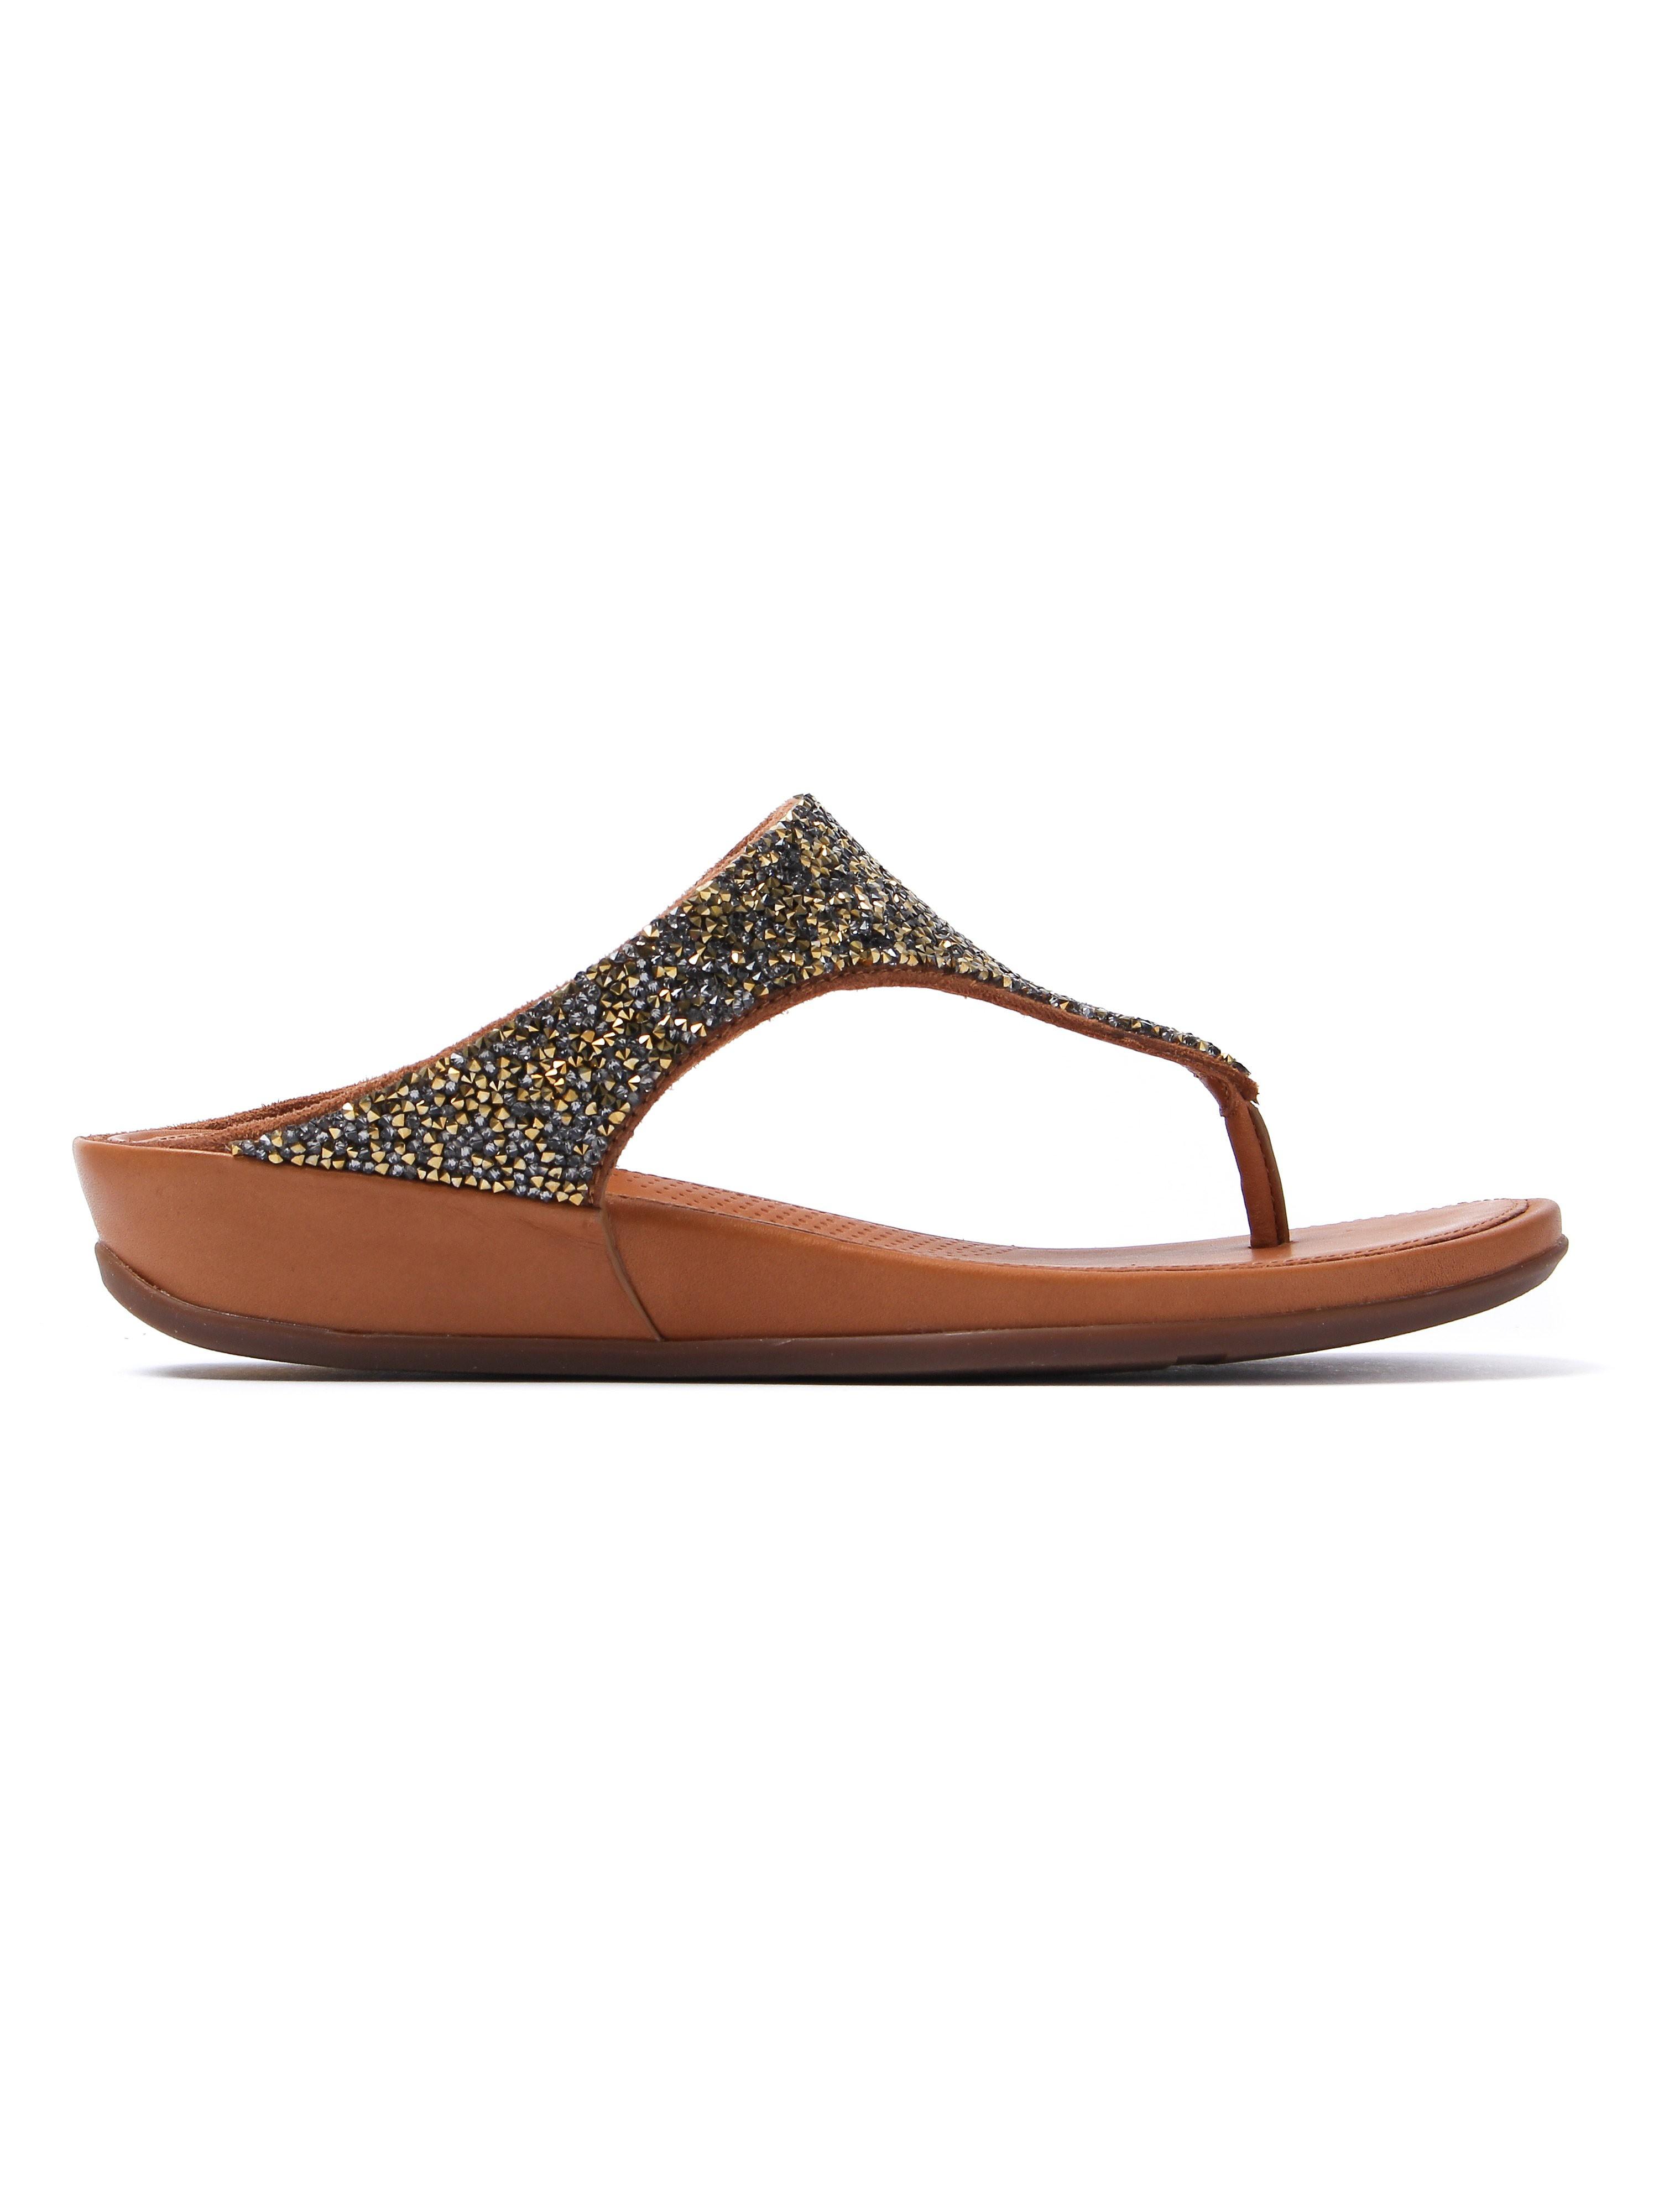 FitFlop Women's Banda Roxy Toe-Post Sandals - Bronze